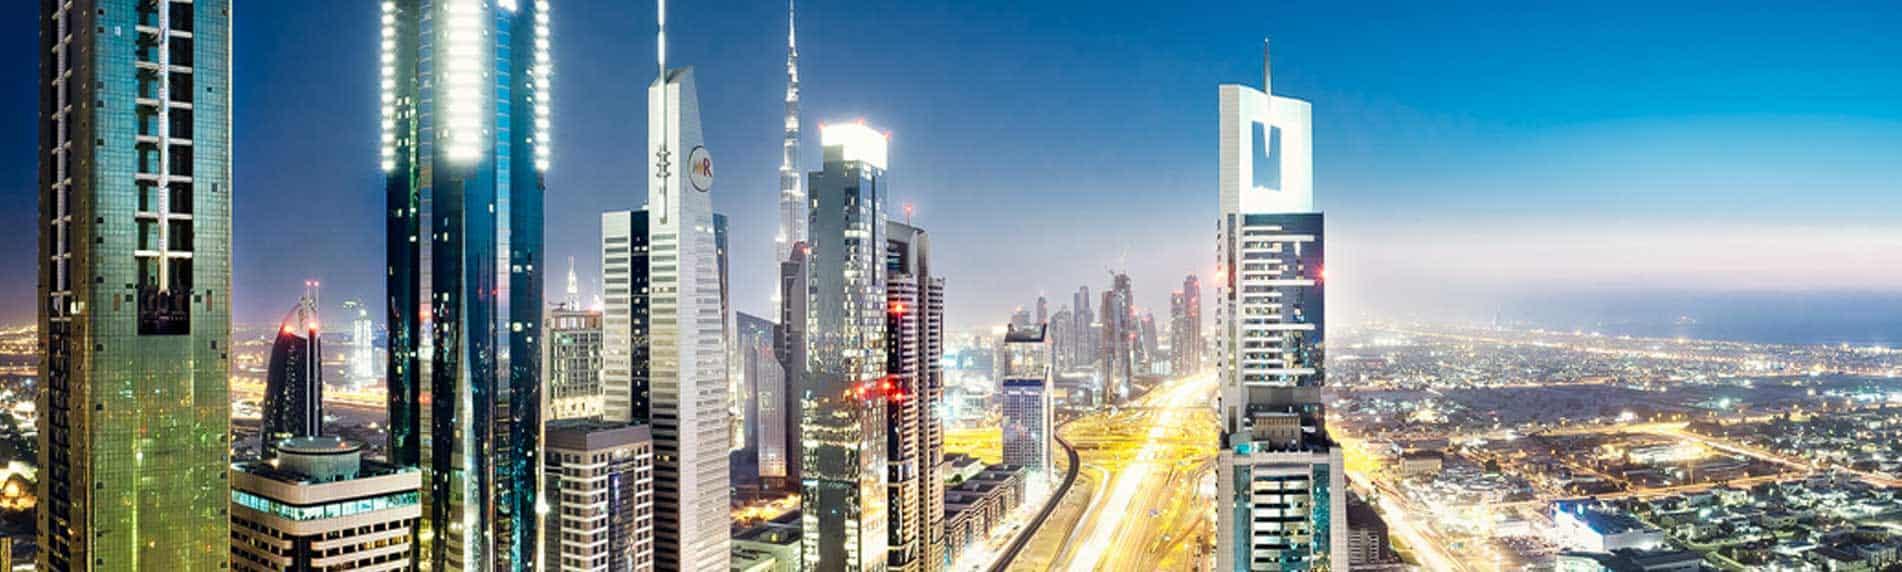 Treasures of Dubai 3 Nights